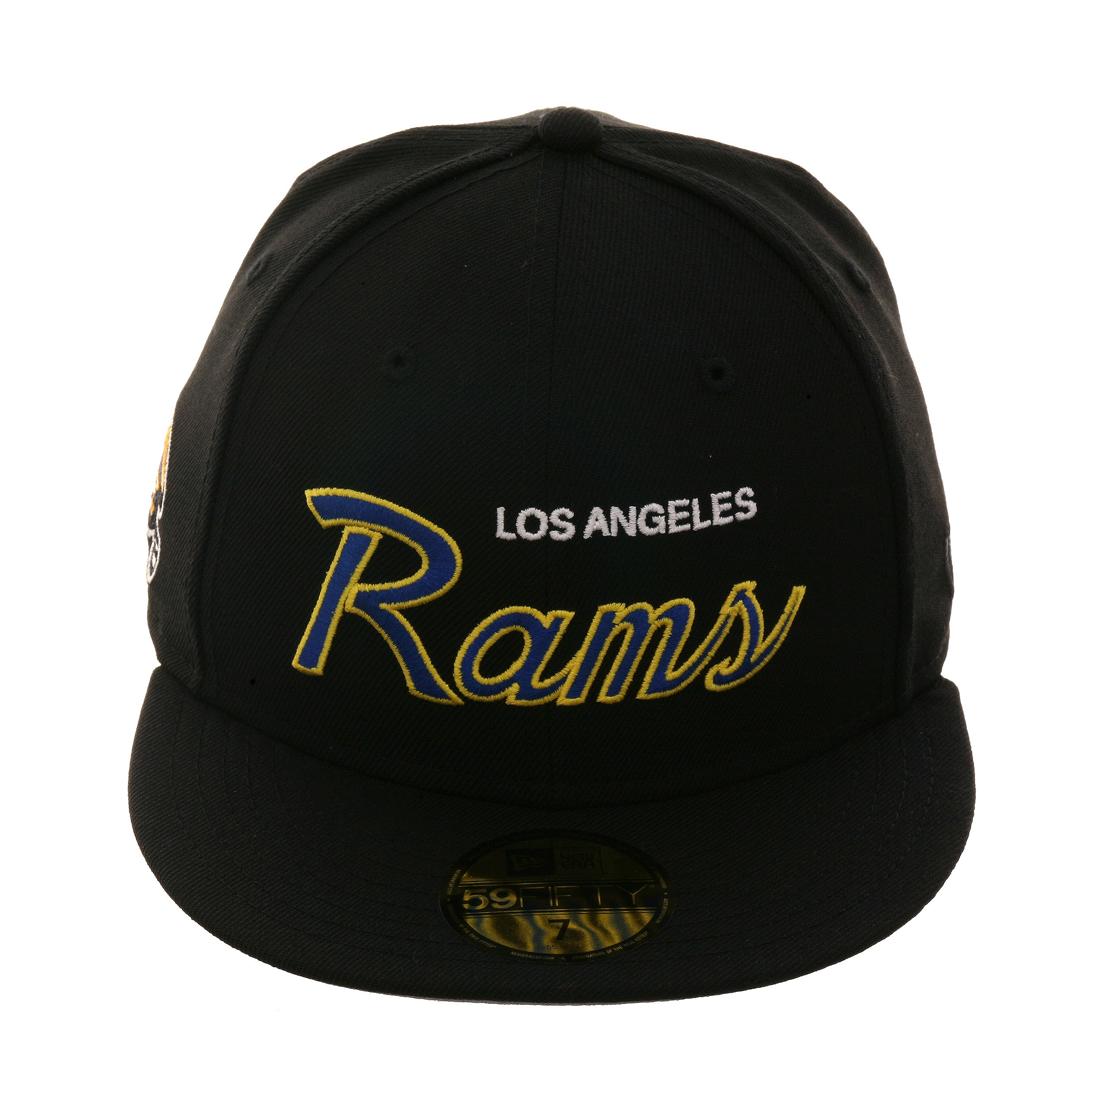 Exclusive New Era 59Fifty Los Angeles Rams Script Hat - Black 5232cba5c